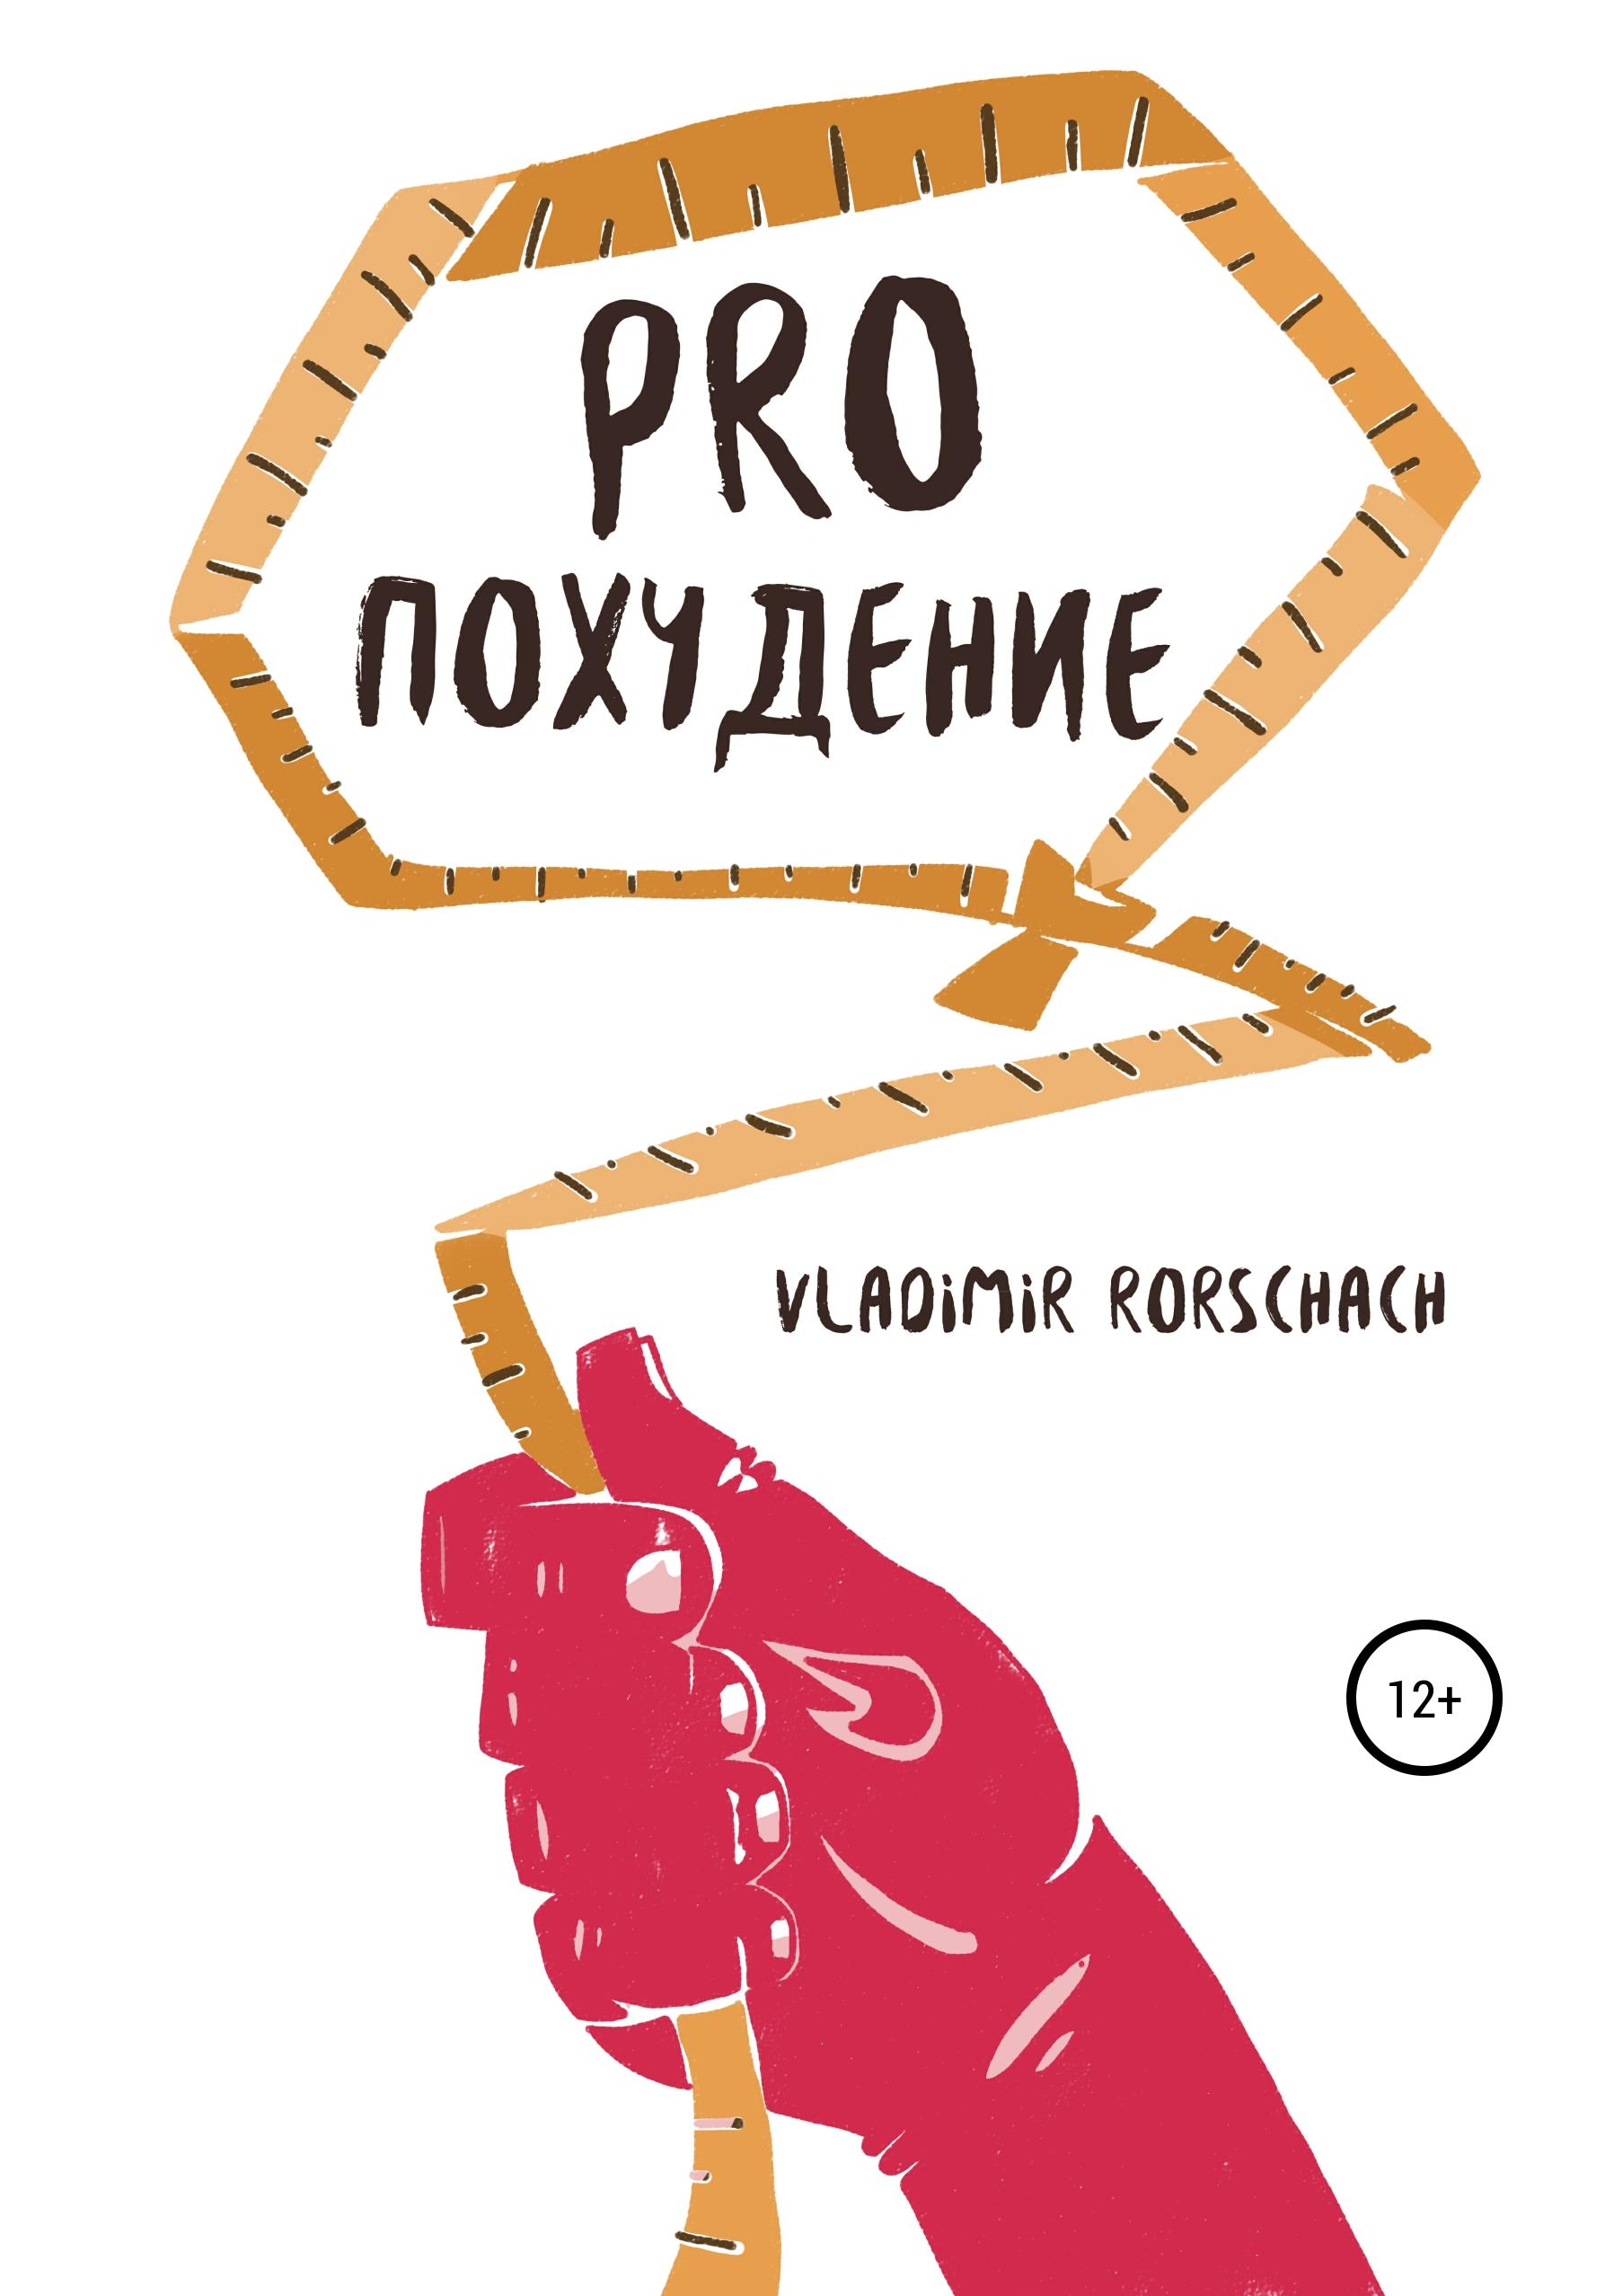 Vladimir Rorschach PRO похудение